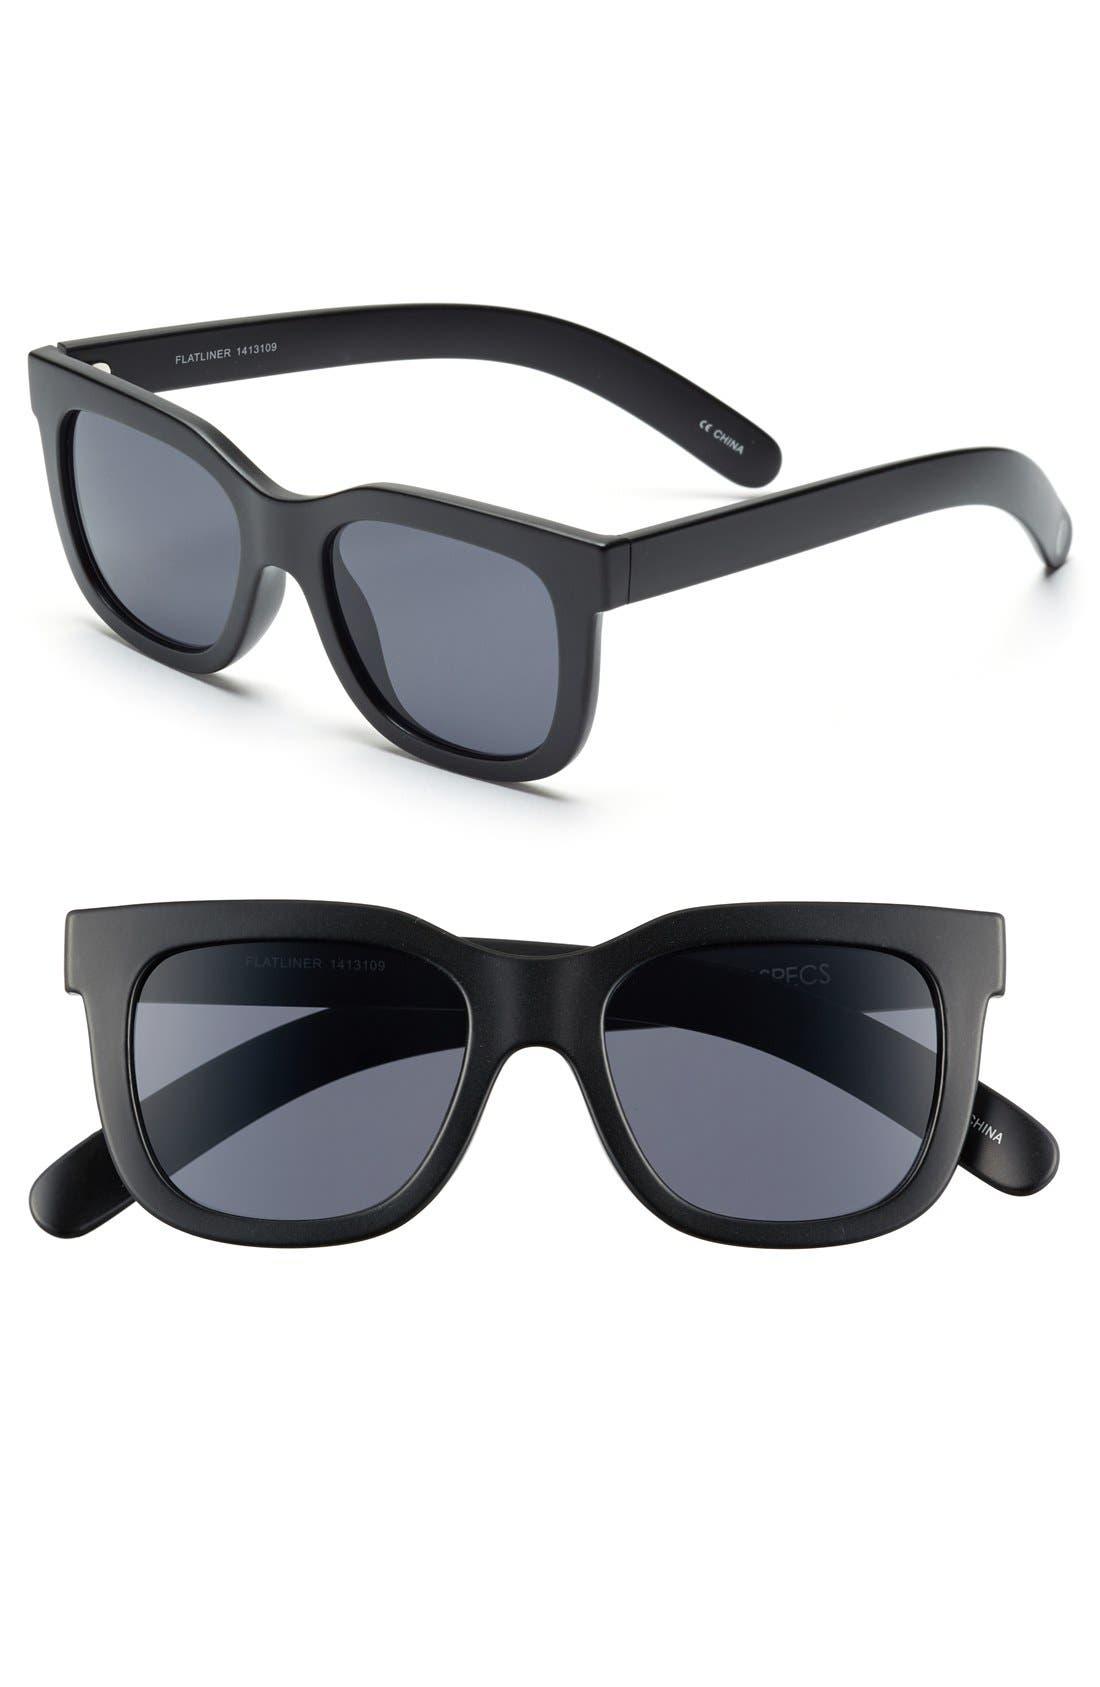 Main Image - Craig and Karl x Le Specs 'Flatliner' 50mm Sunglasses